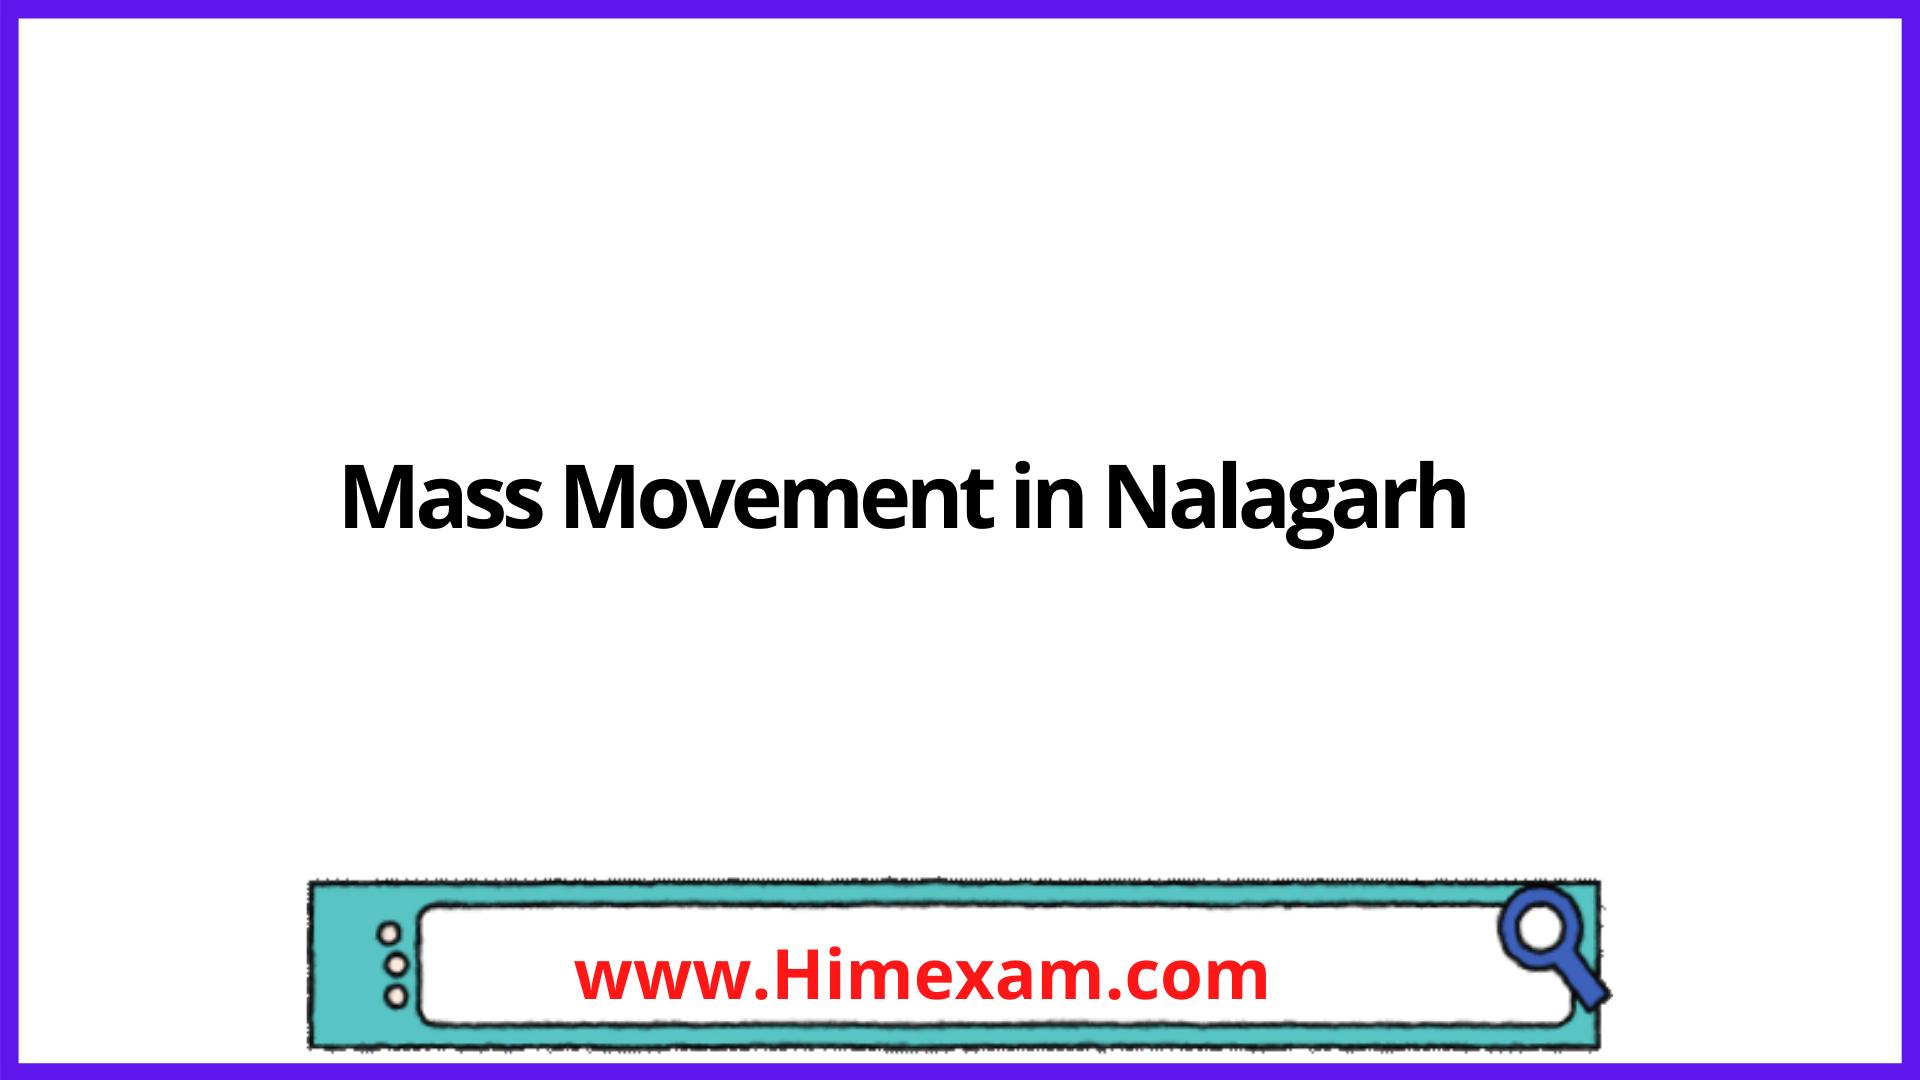 Mass Movement in Nalagarh